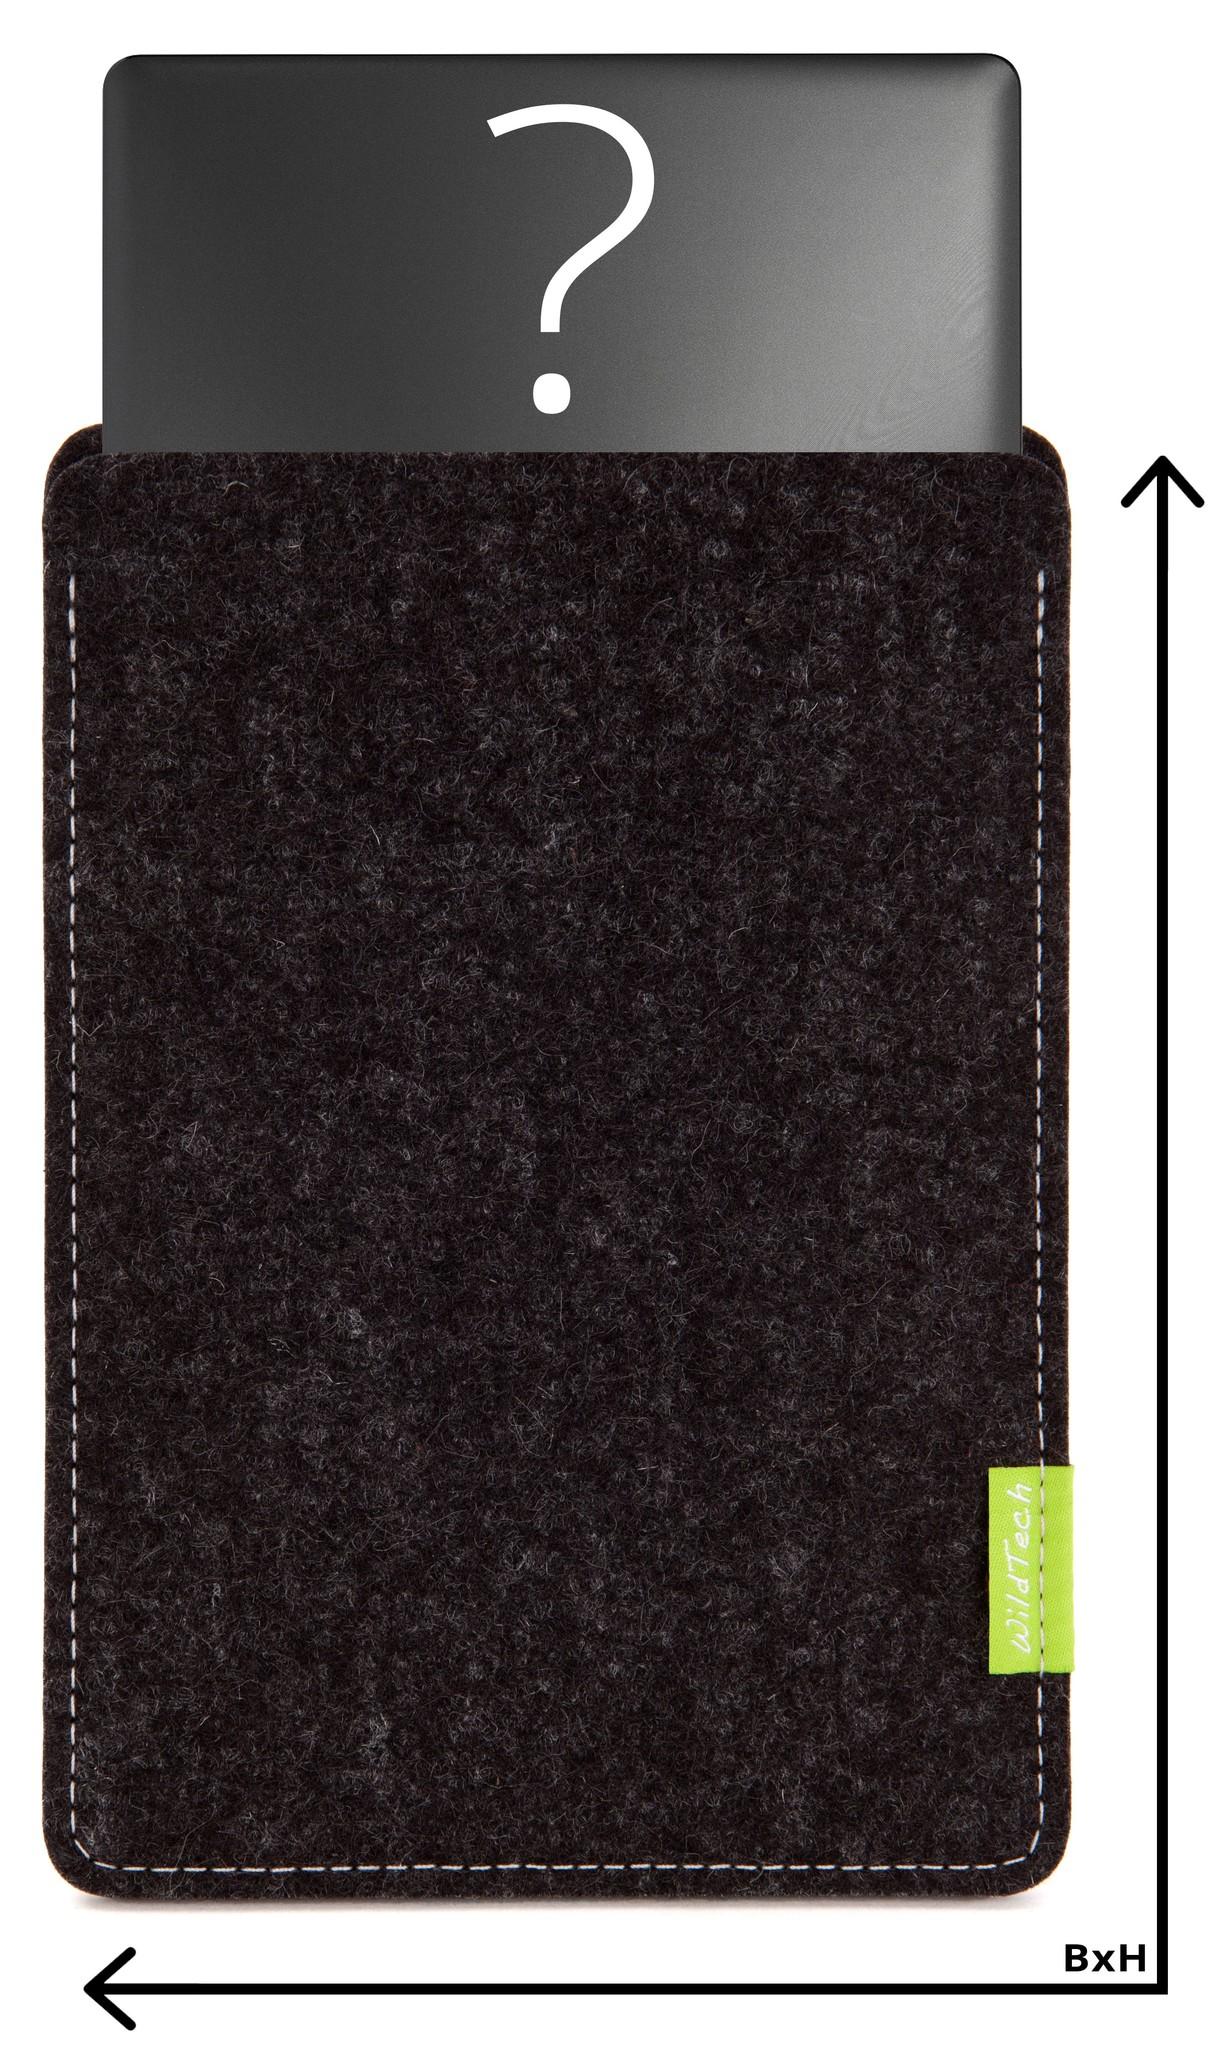 Individuelles Notebook Sleeve Anthrazit-1